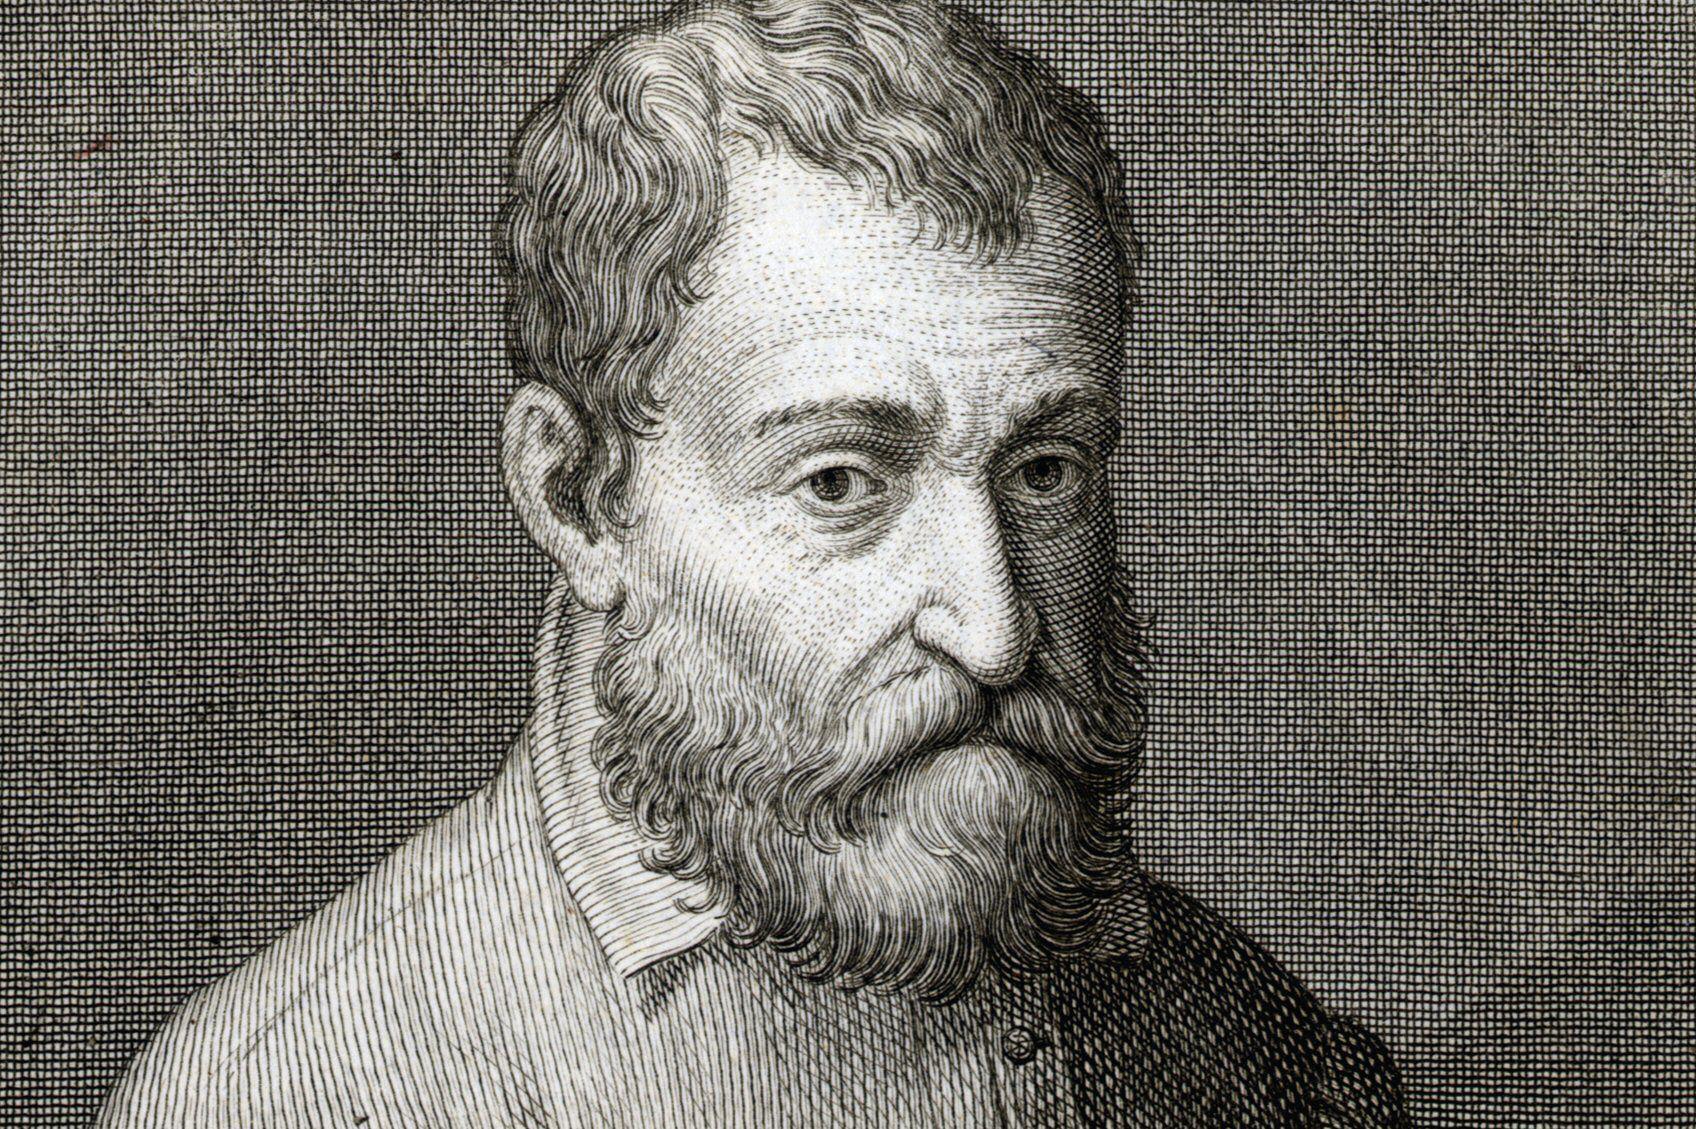 a biography of giacomo barozzi da vignola Pietro cataneo was born at the beginning of the 16th century in siena, where he   e bassi, nota introduttiva, pietro cataneo, giacomo barozzi da vignola.